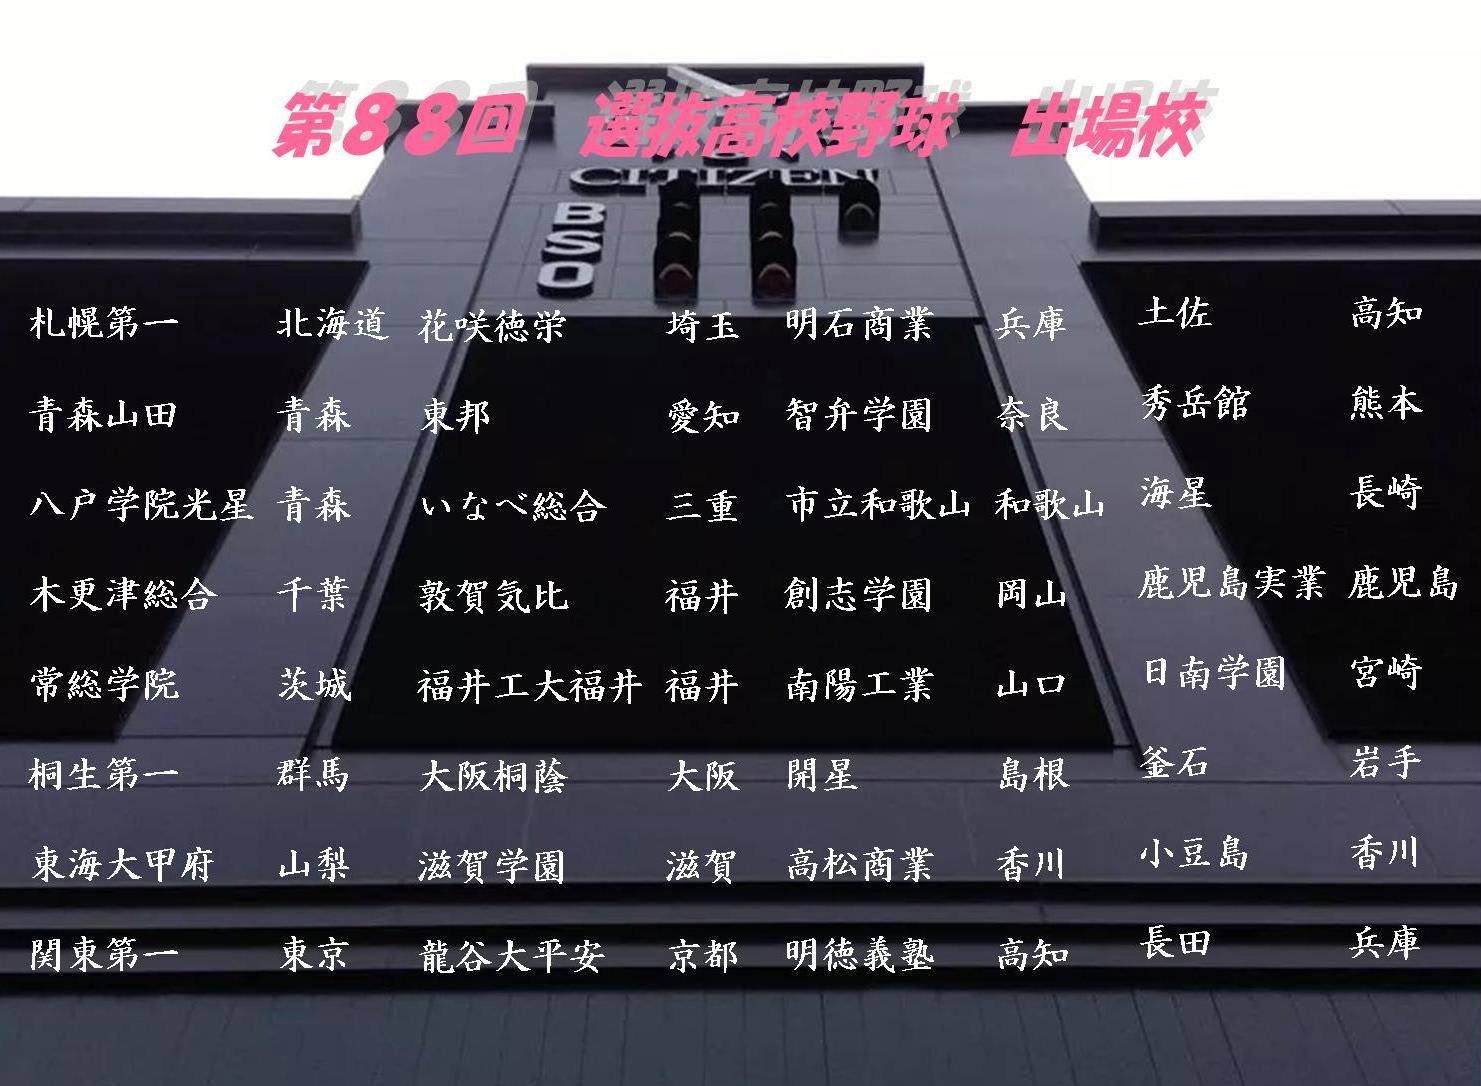 2016 春☆甲子園 選抜出場校☆彡 - 甲子園きっぷ yama's stadium☆彡